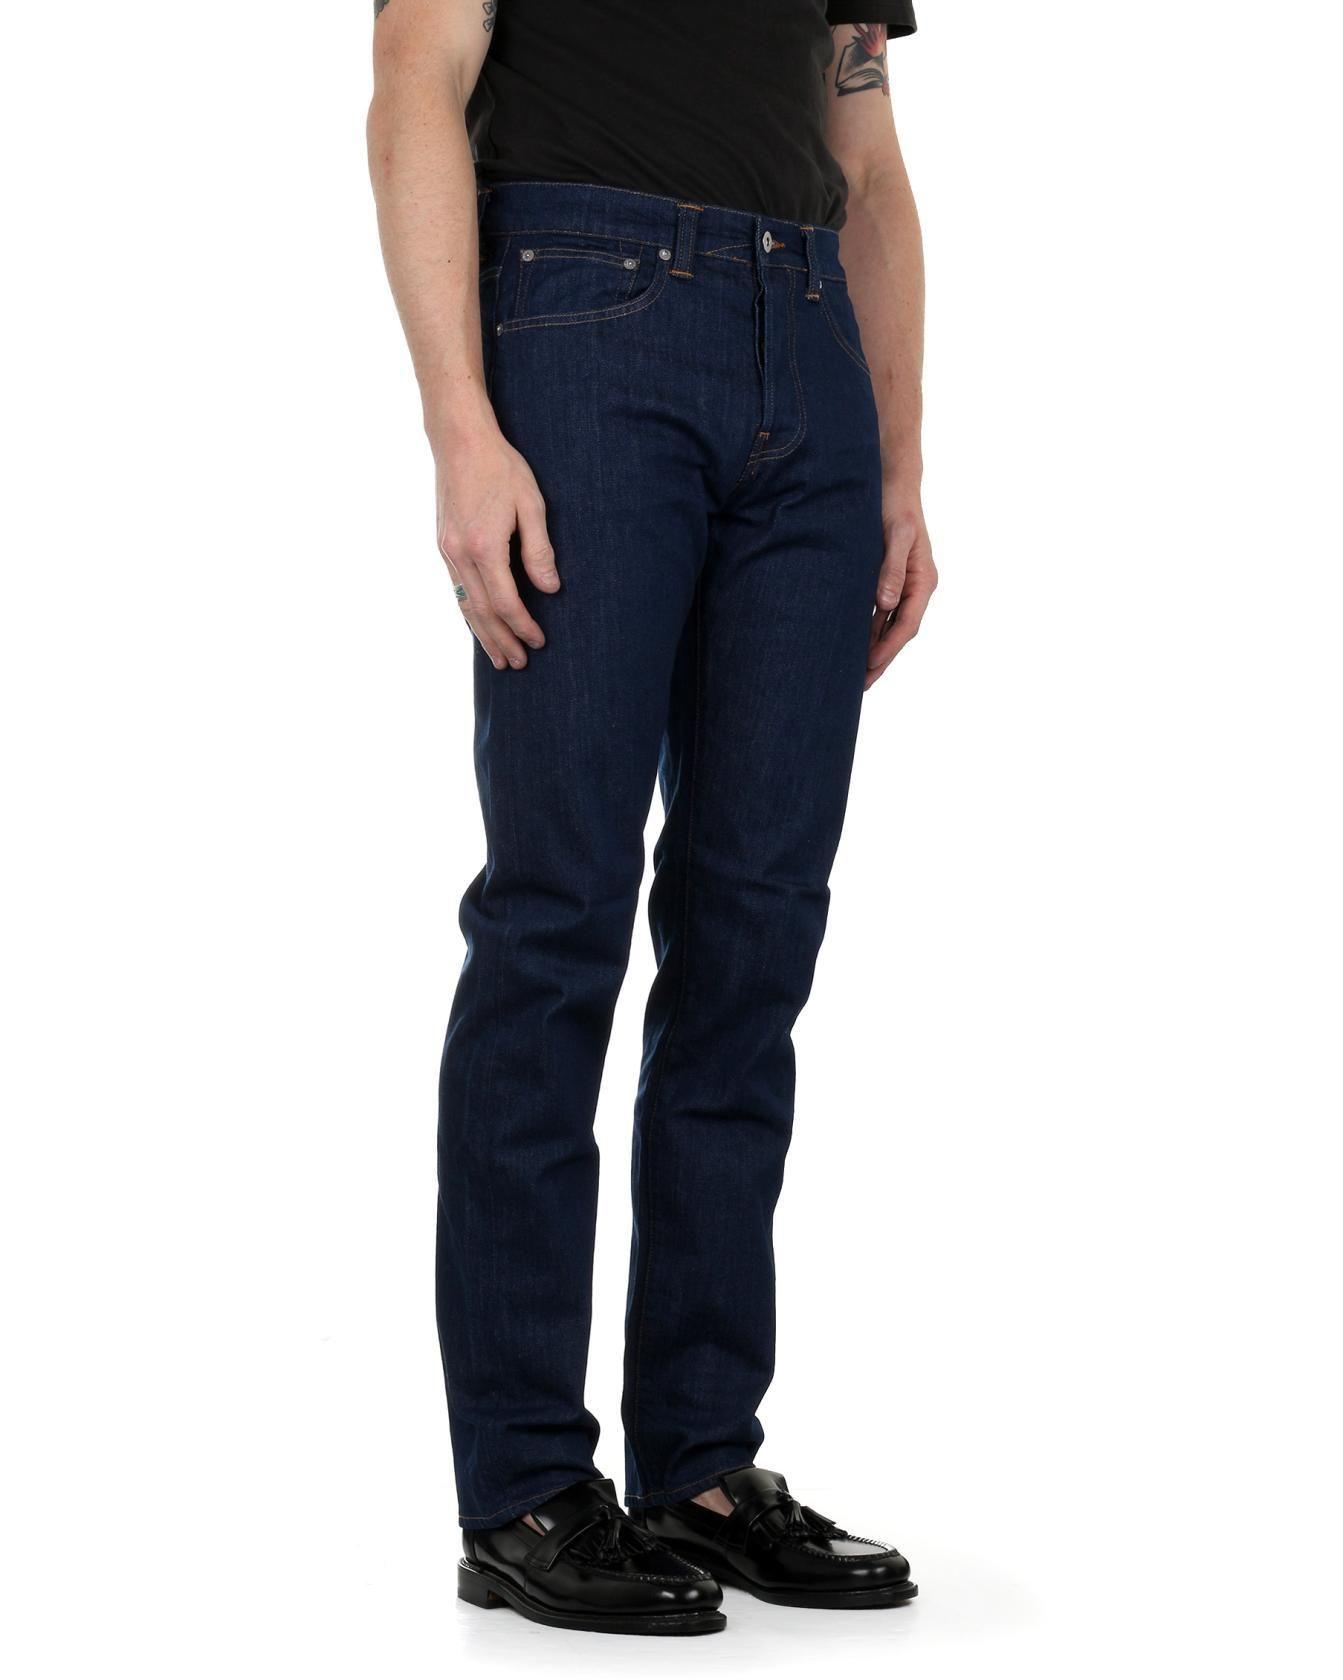 Edwin ED-80 Slim Fit Mens Jeans Kingston Blue Rinsed